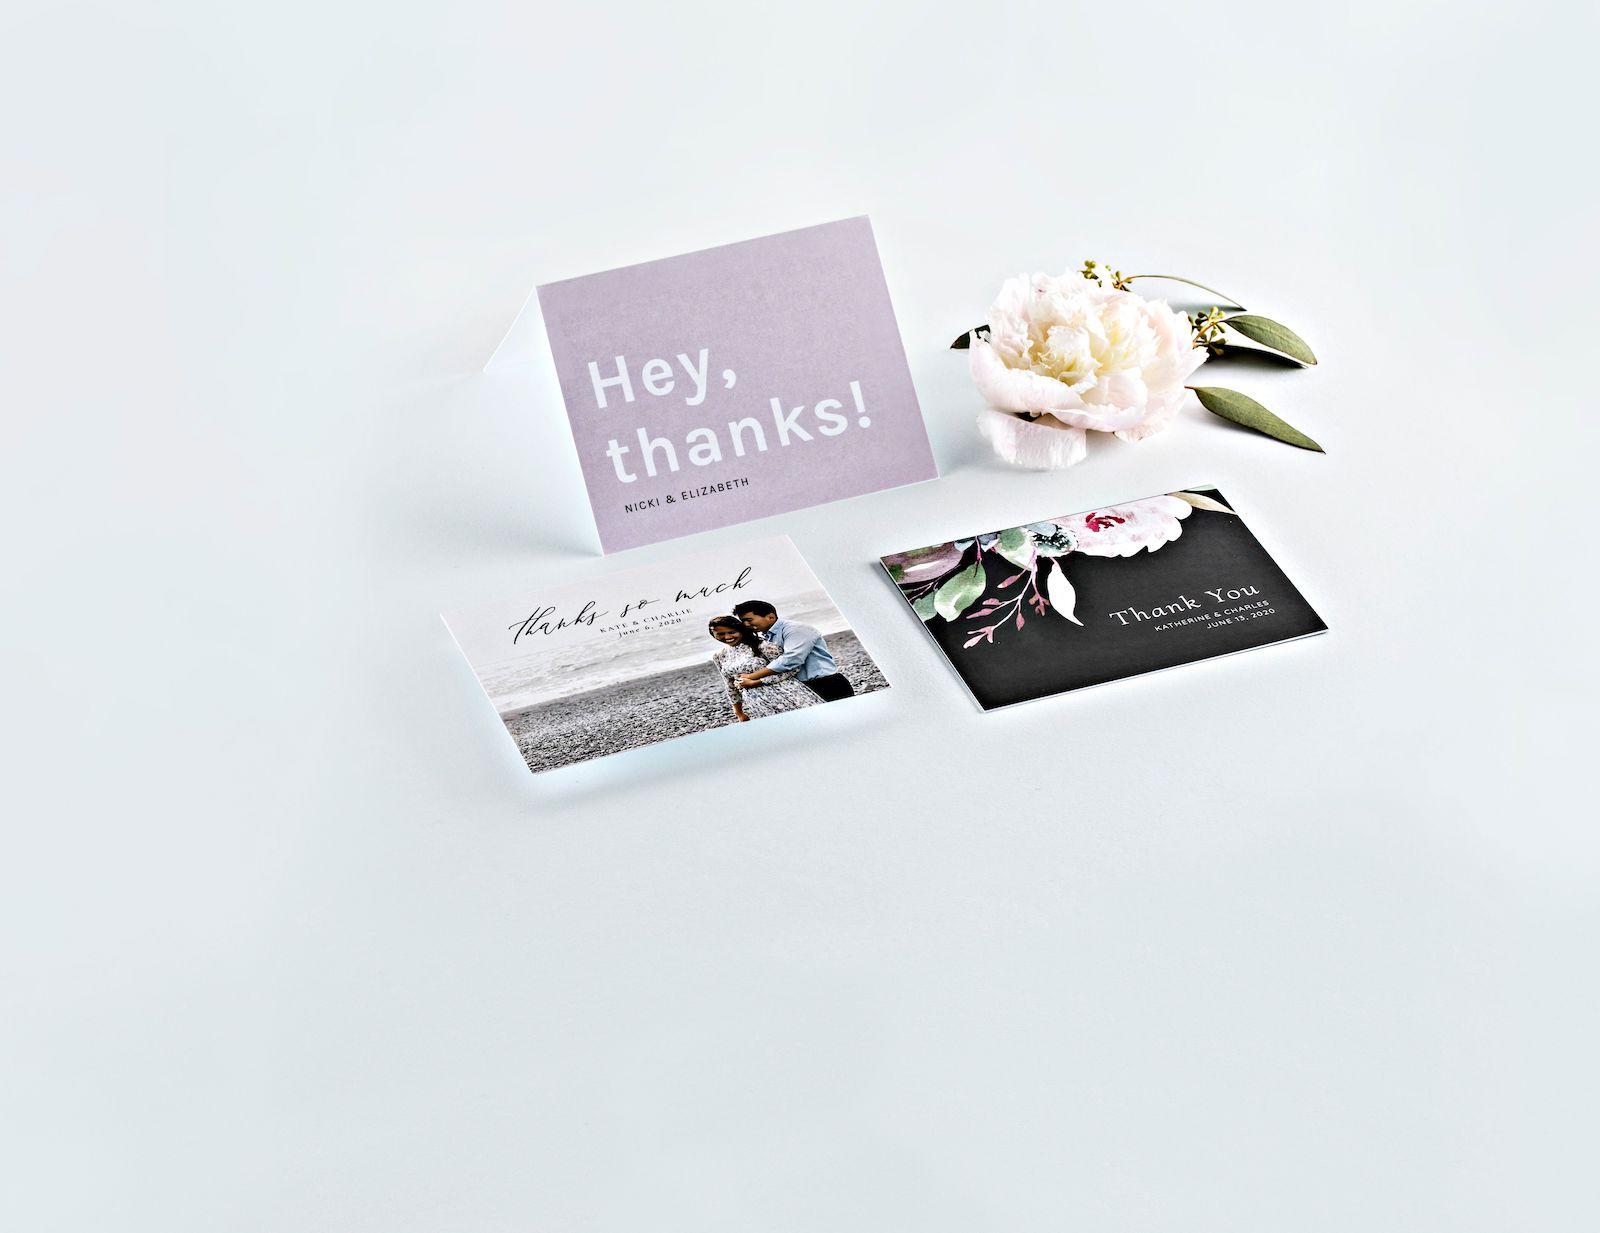 bridal shower thank you card etiquette expert wedding advice